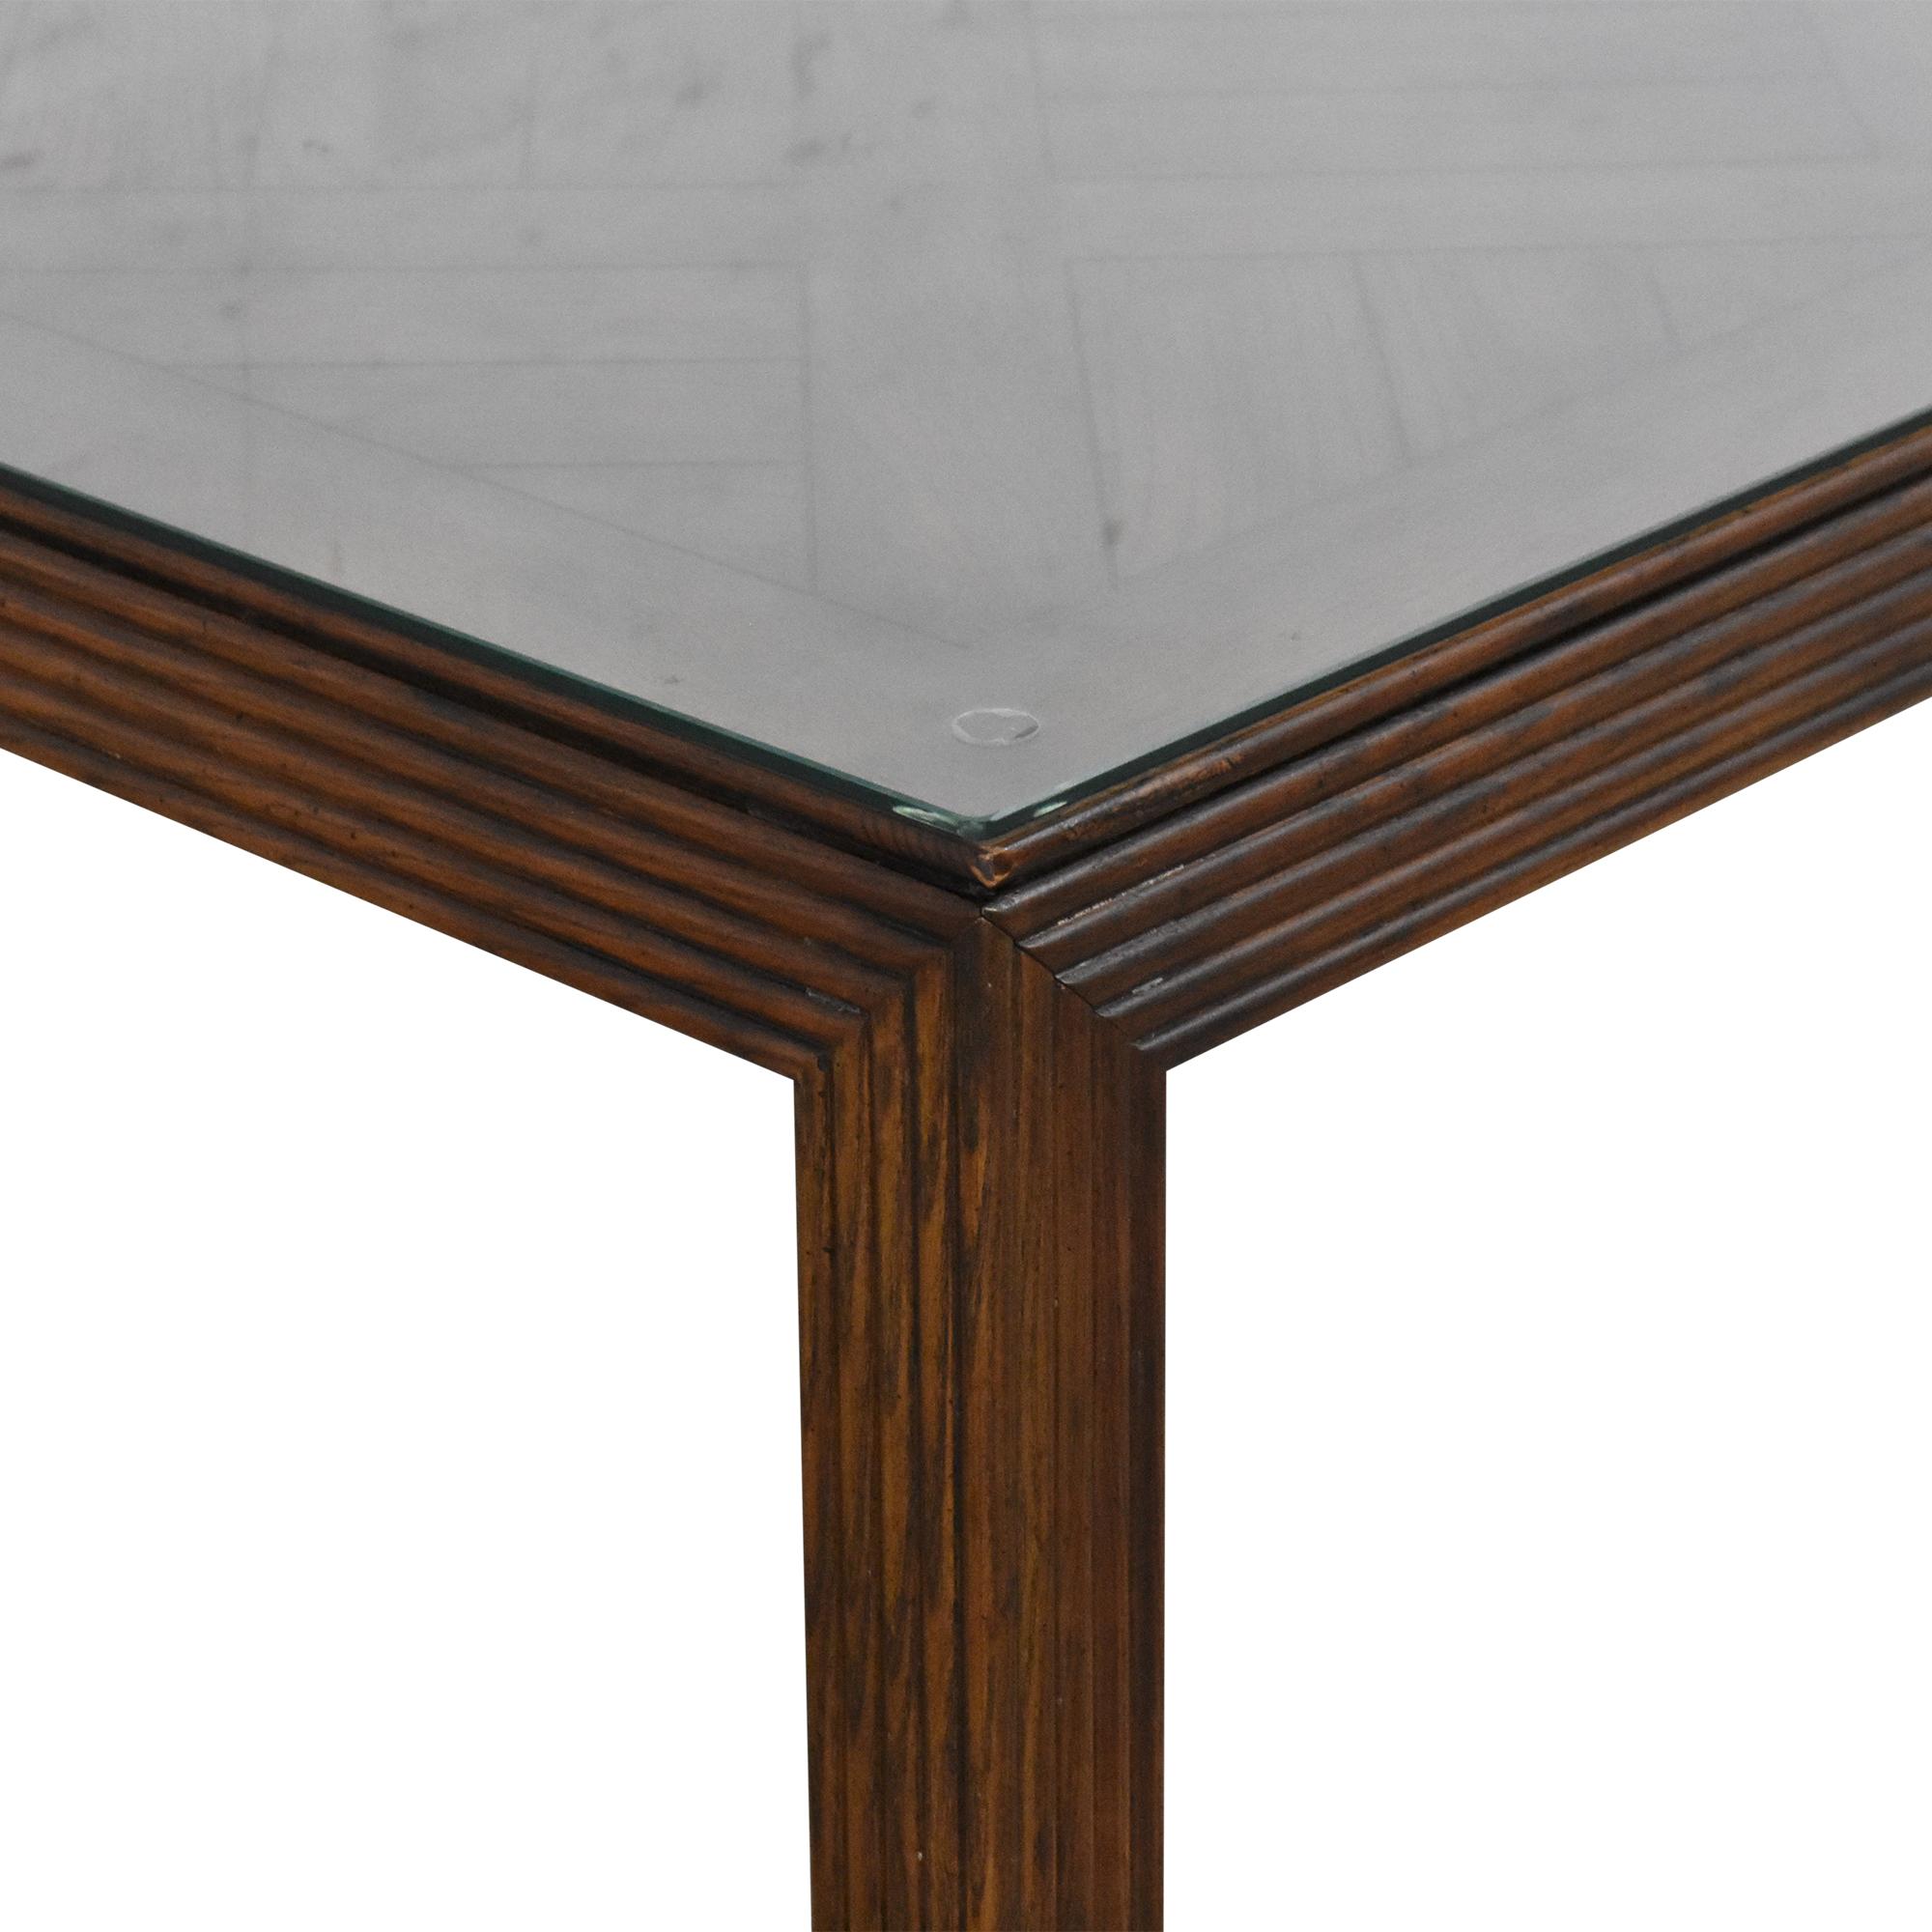 Henredon Furniture Square Coffee Table Henredon Furniture